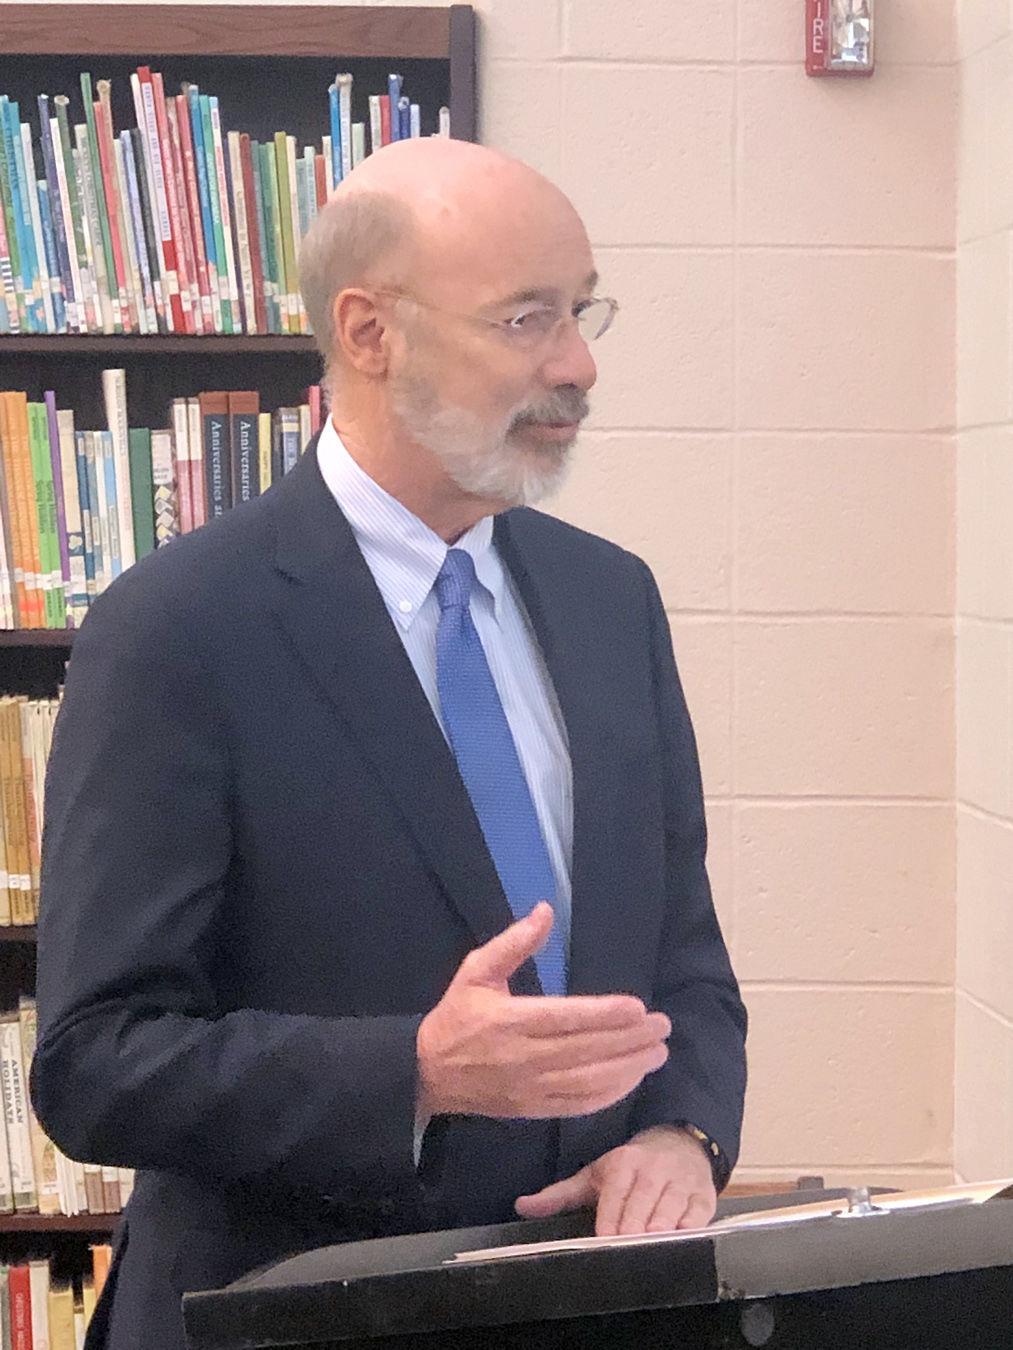 Gov. Tom Wolf visits Greene County